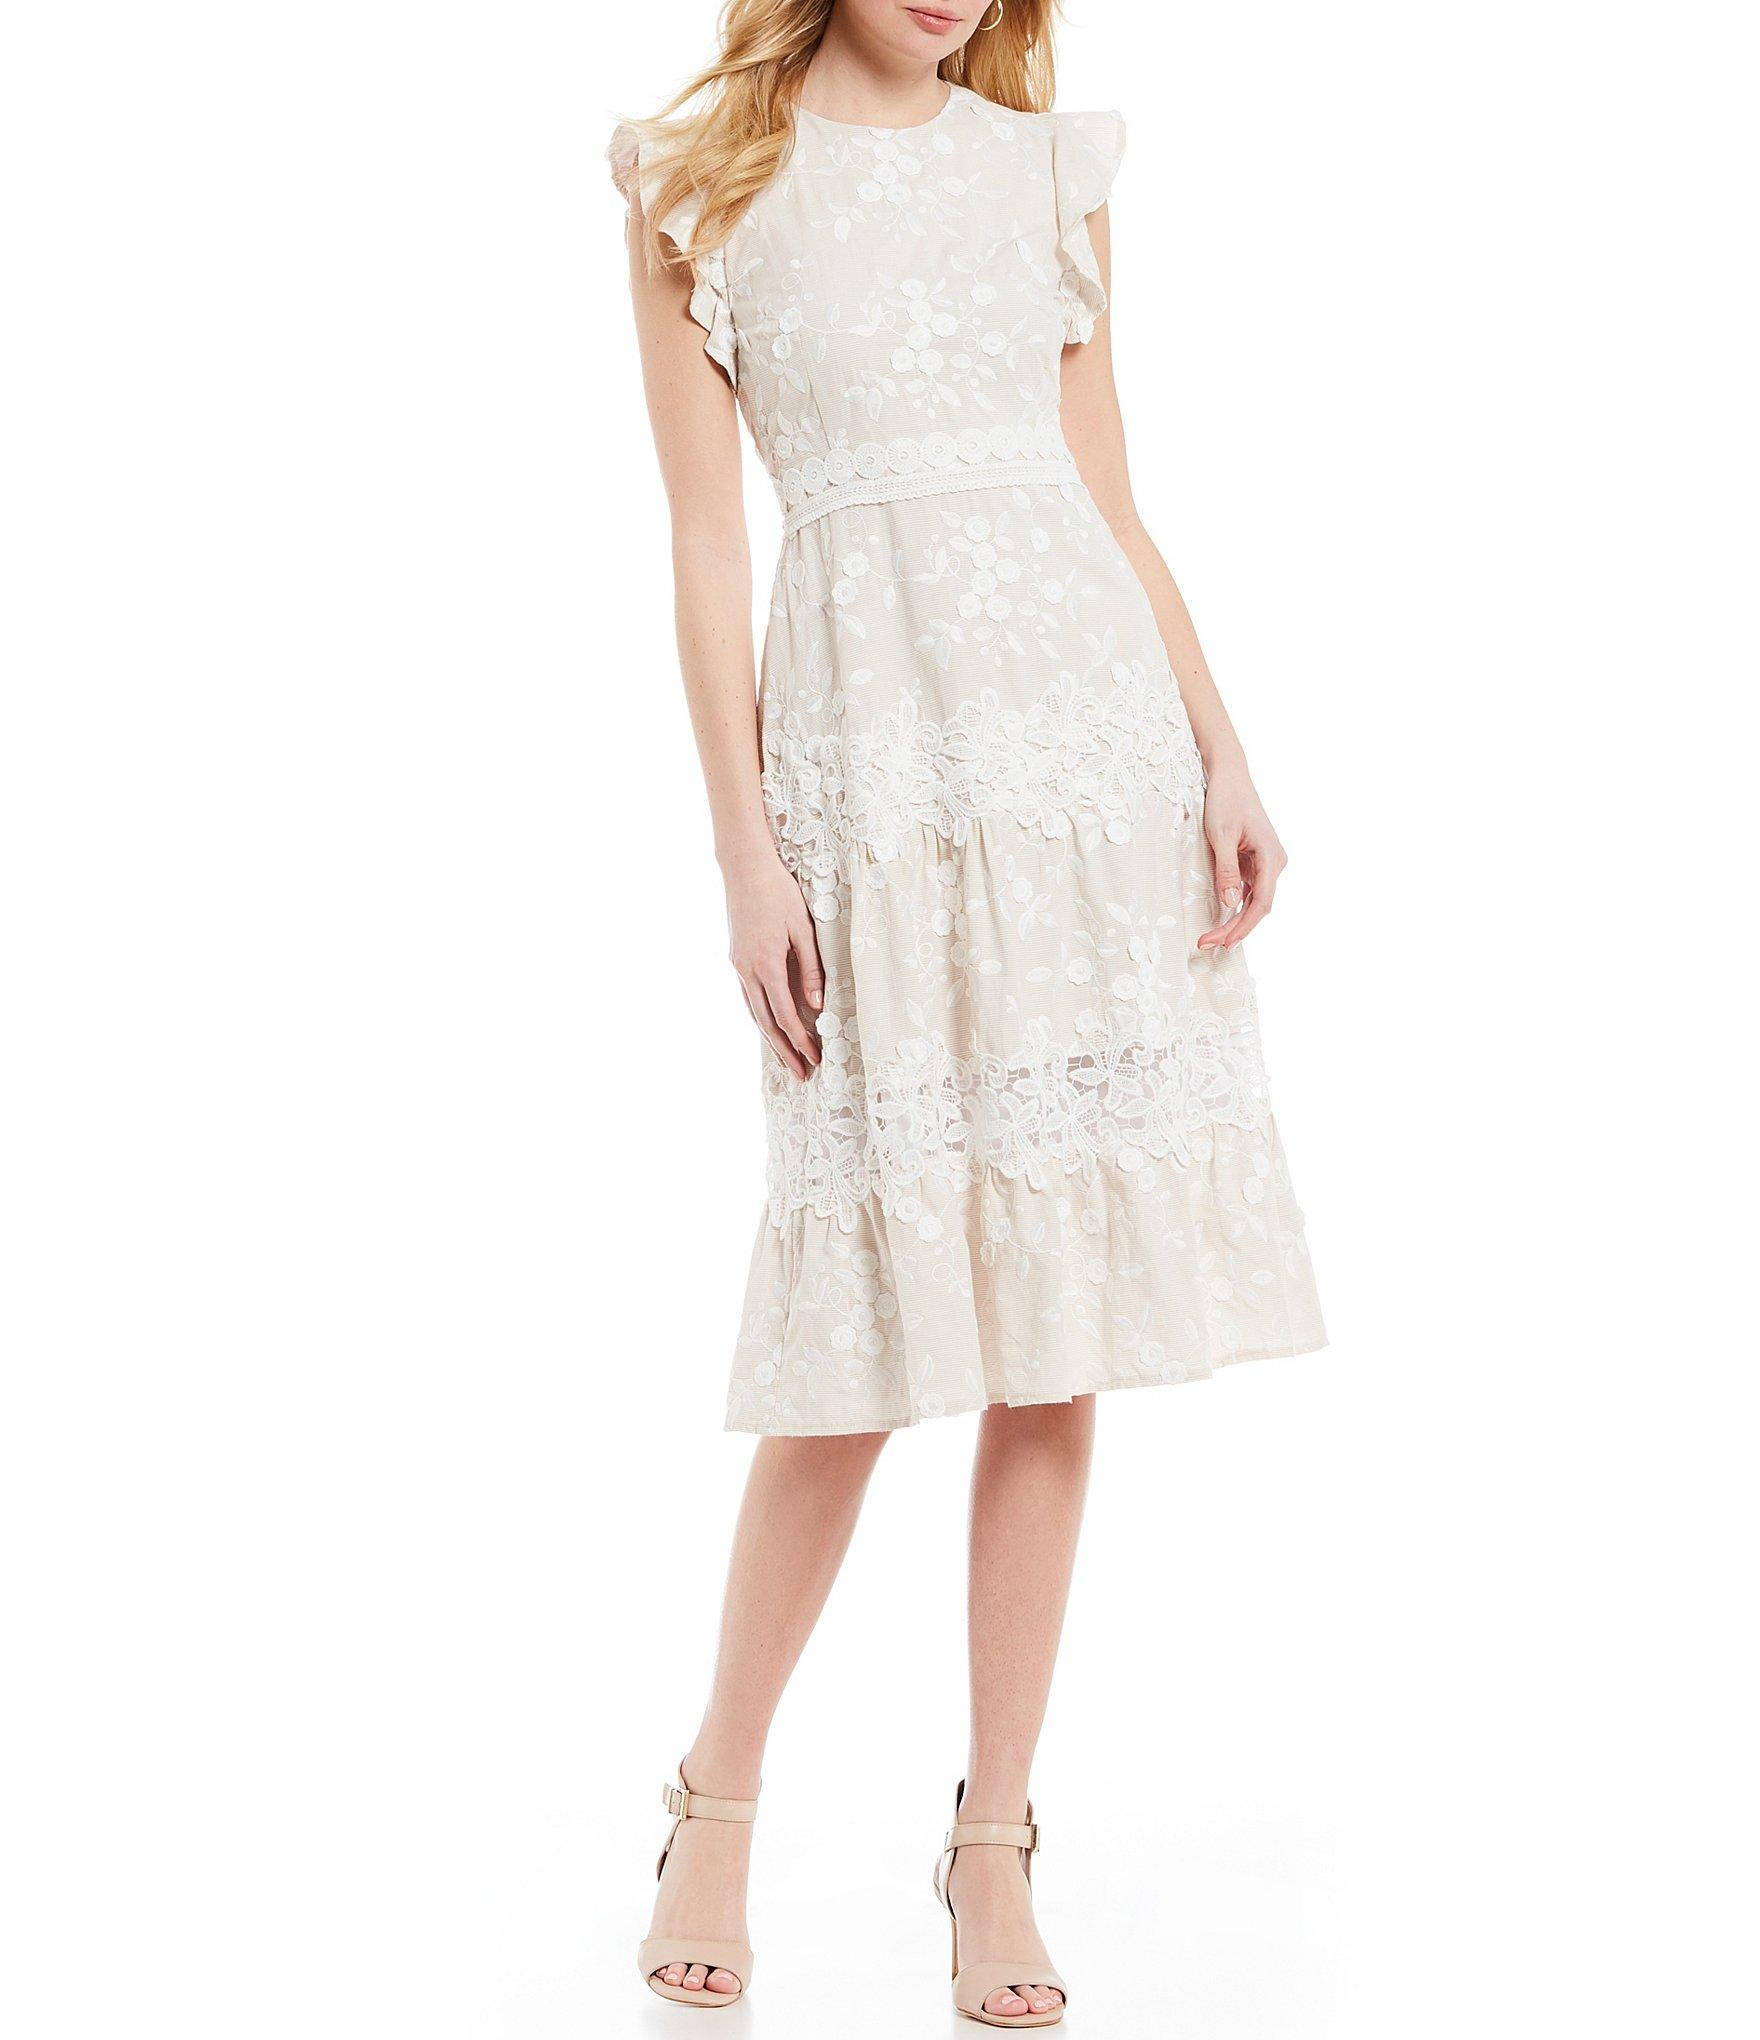 31c6fac43a Antonio Melani. Women s White Flutter Janet Sleeve Tiered Ruffle A-line Midi  Dress